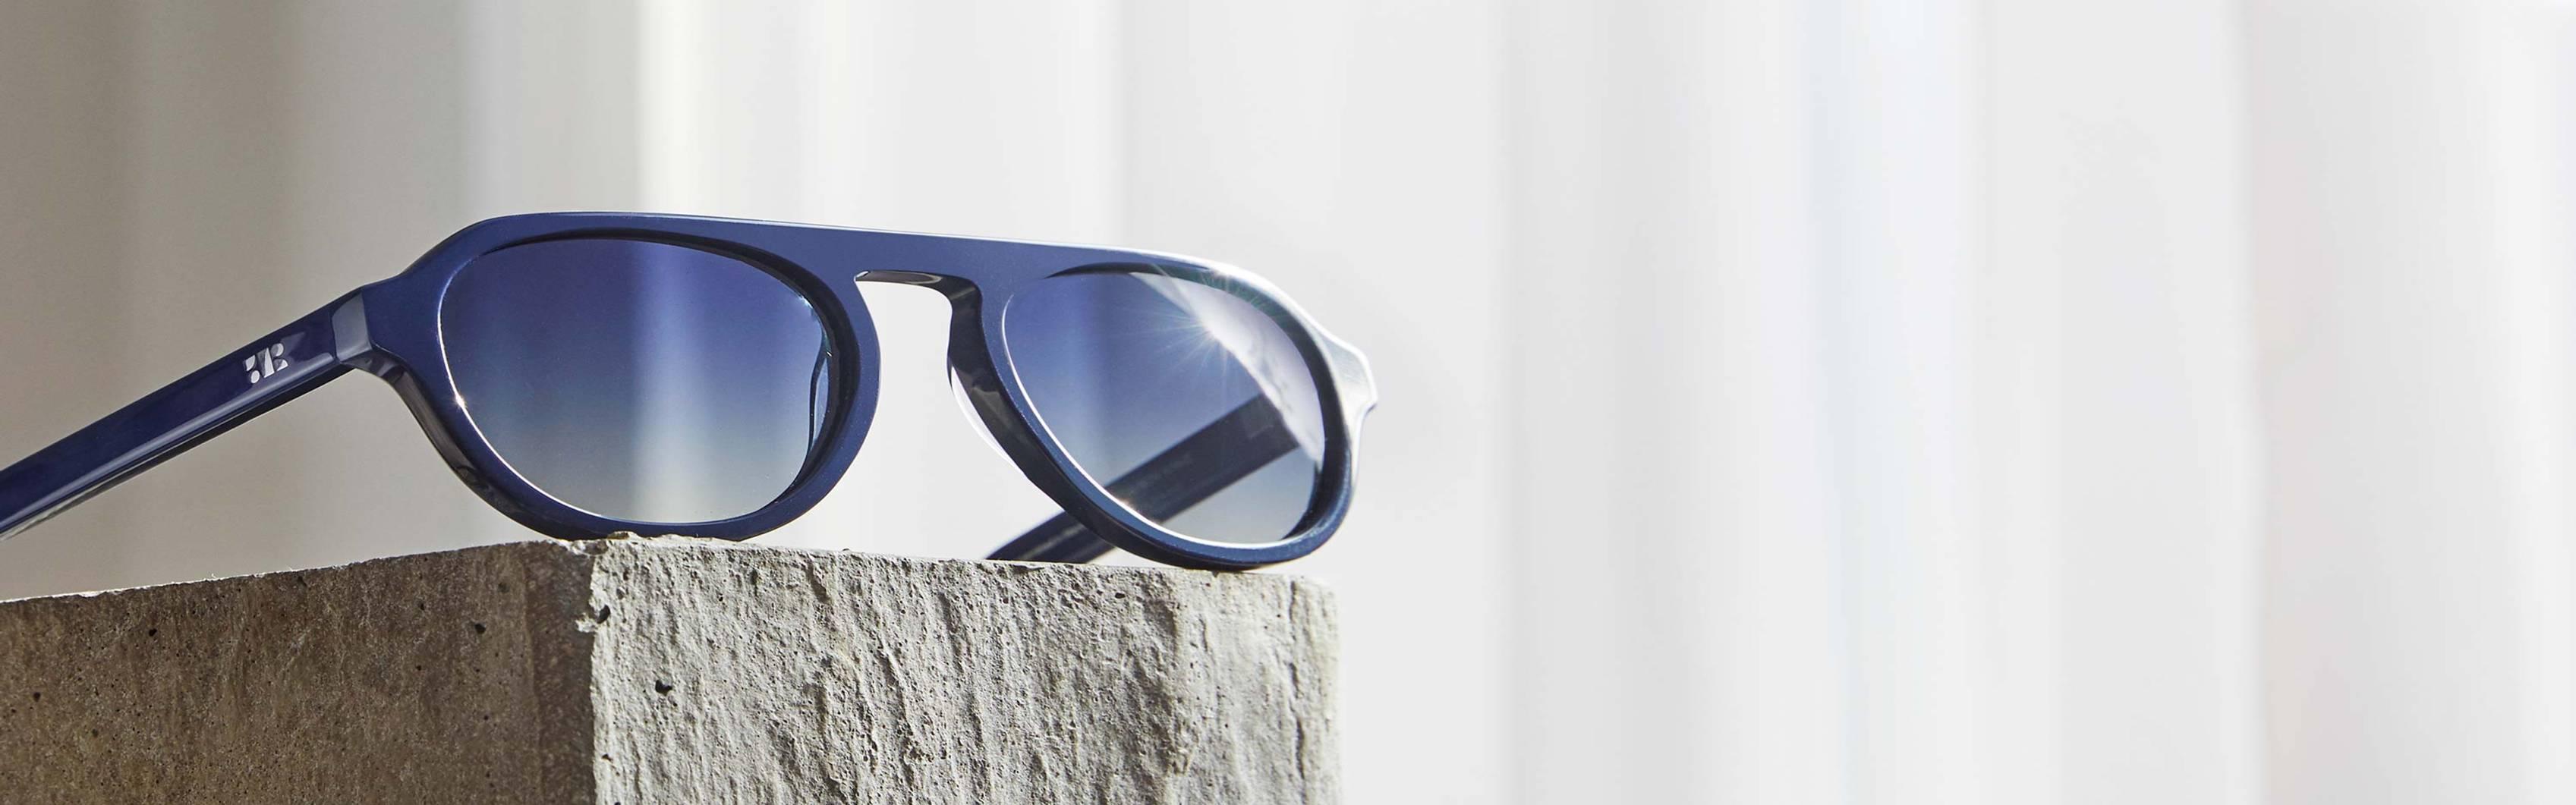 Best Selling Sunglasses